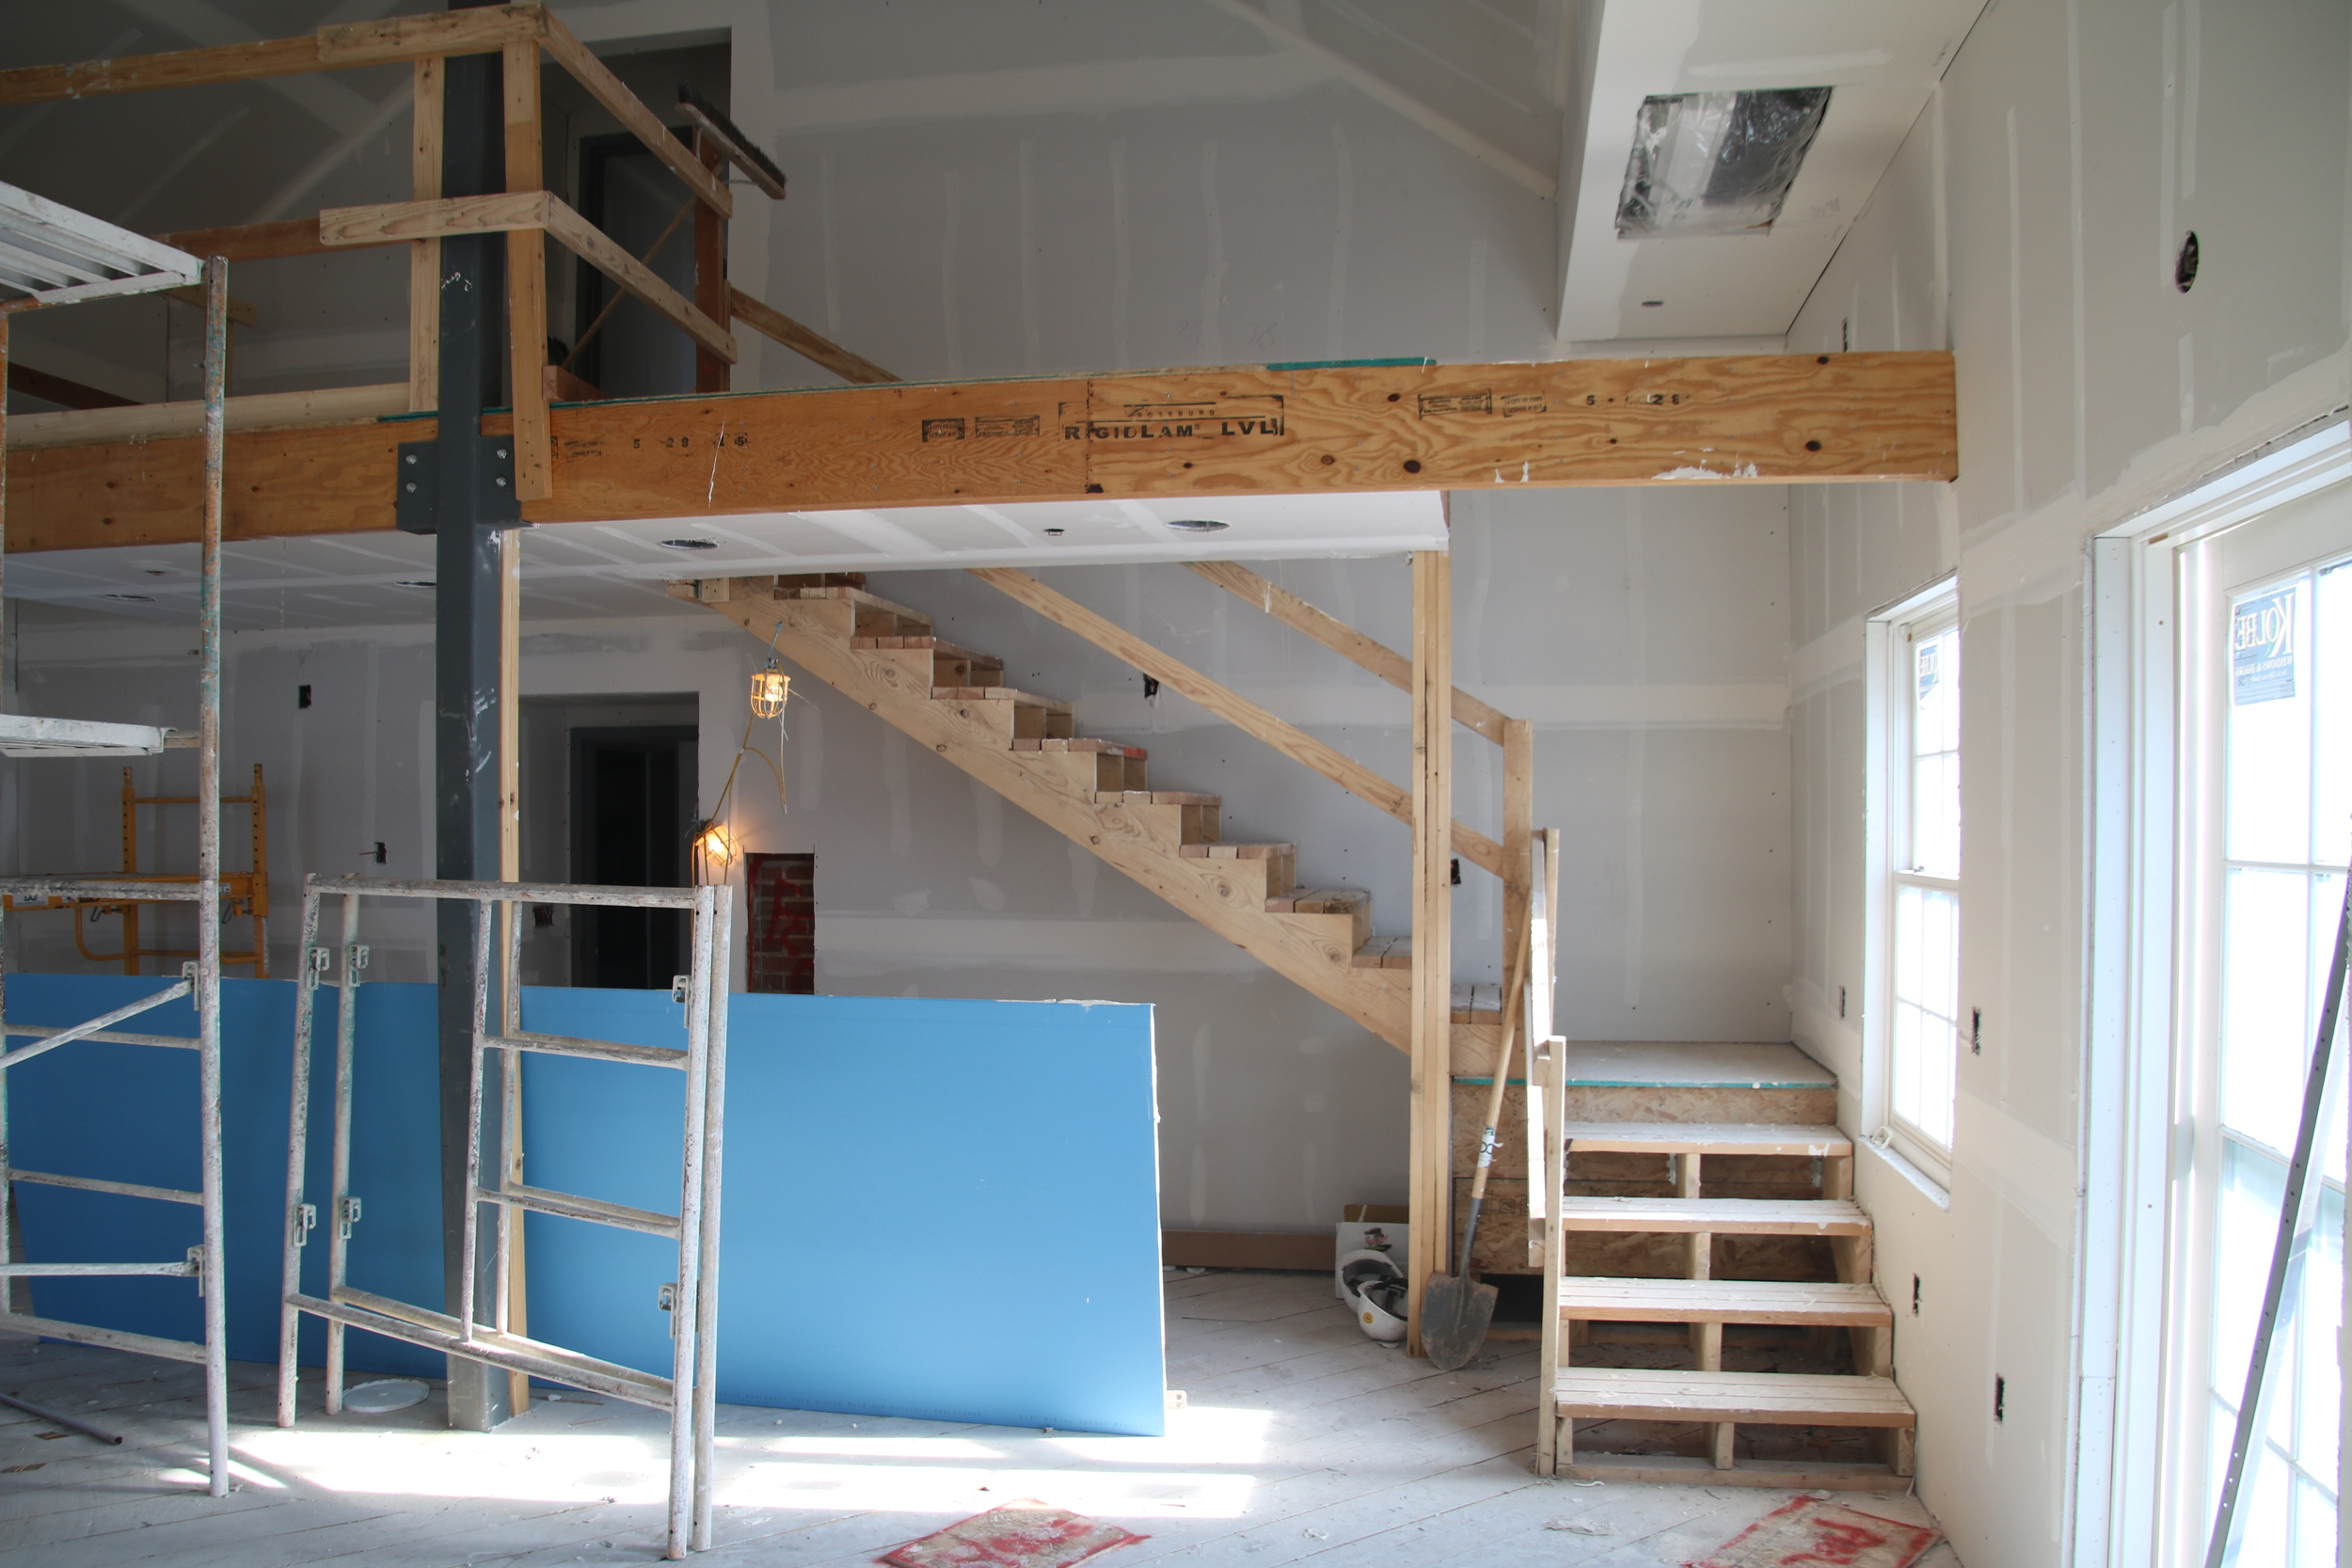 2015-12-21 library loft stairs.JPG